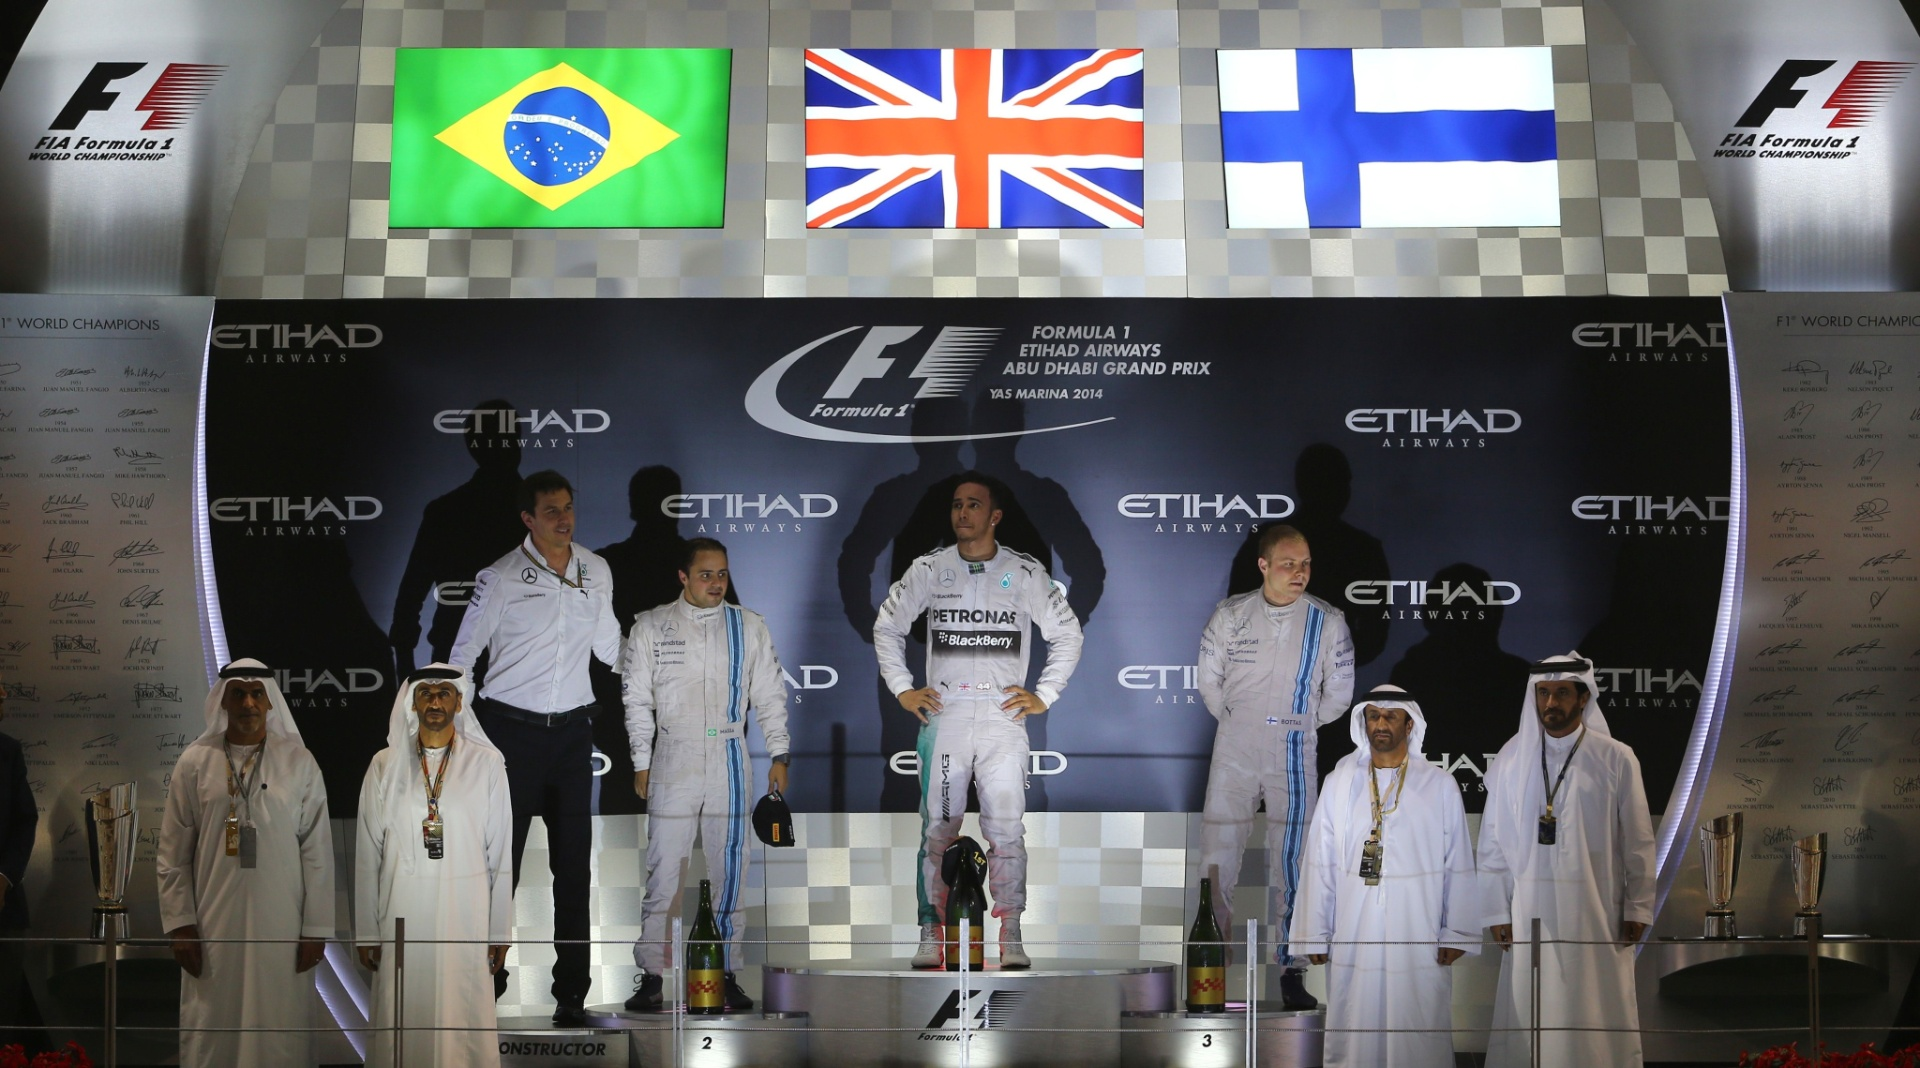 Hamilton ocupa o lugar mais alto do pódio ao lado de Felipe Massa e Valtteri Bottas